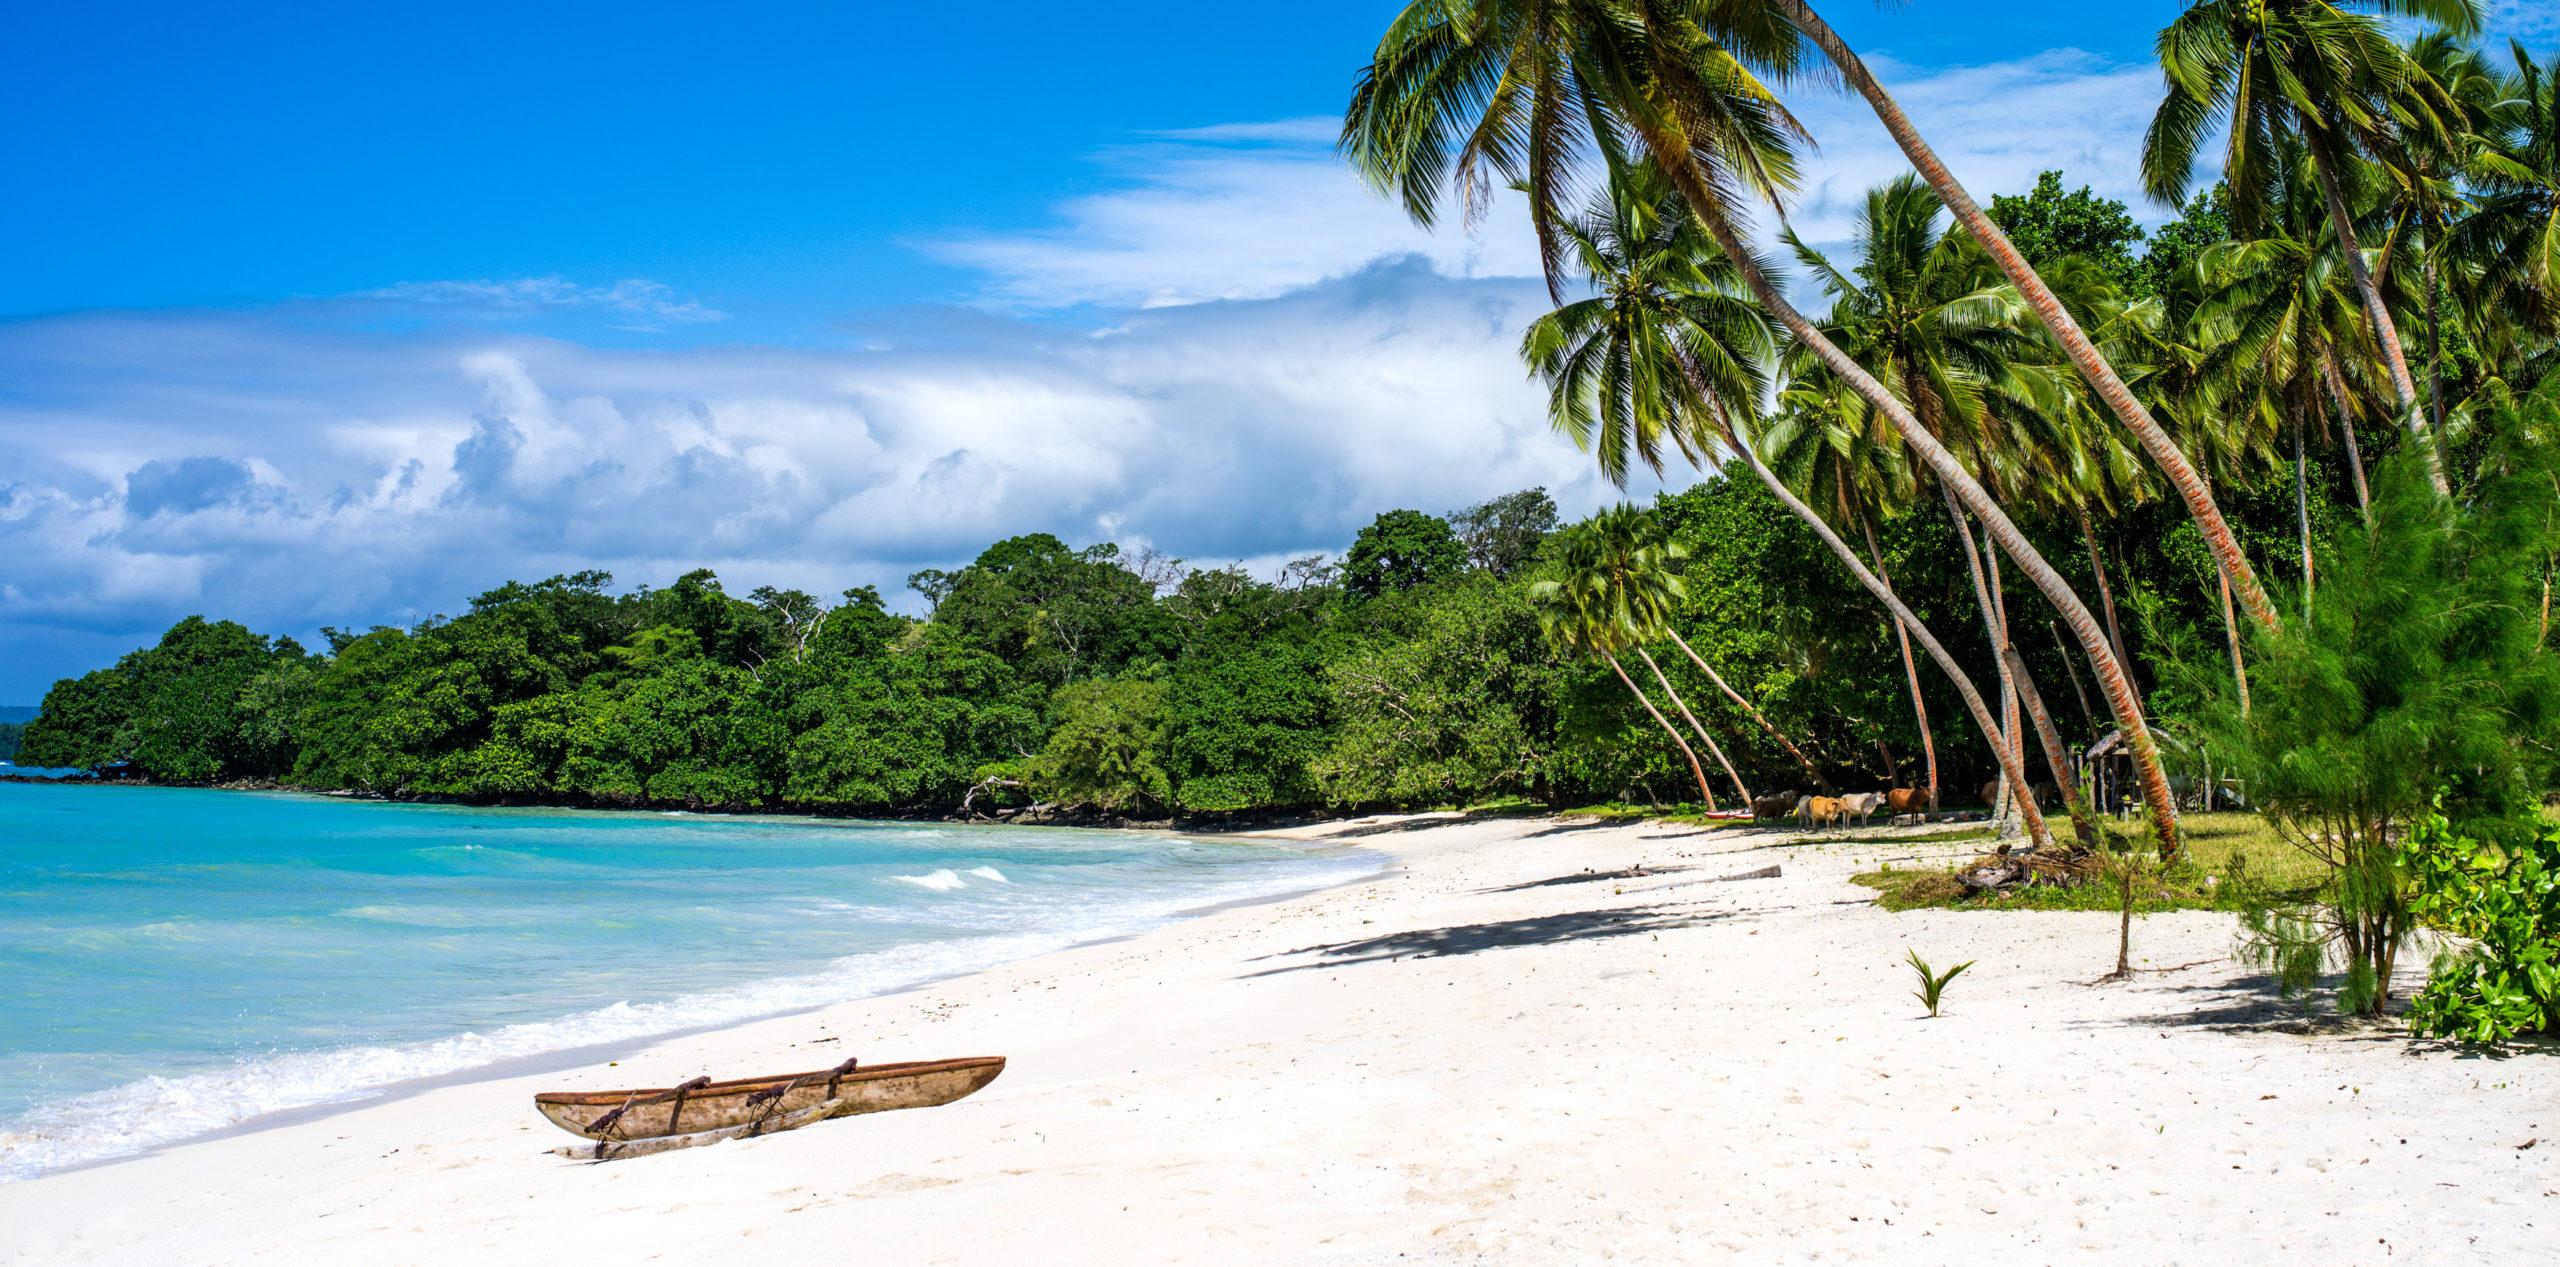 port olry beach santo vanuatu